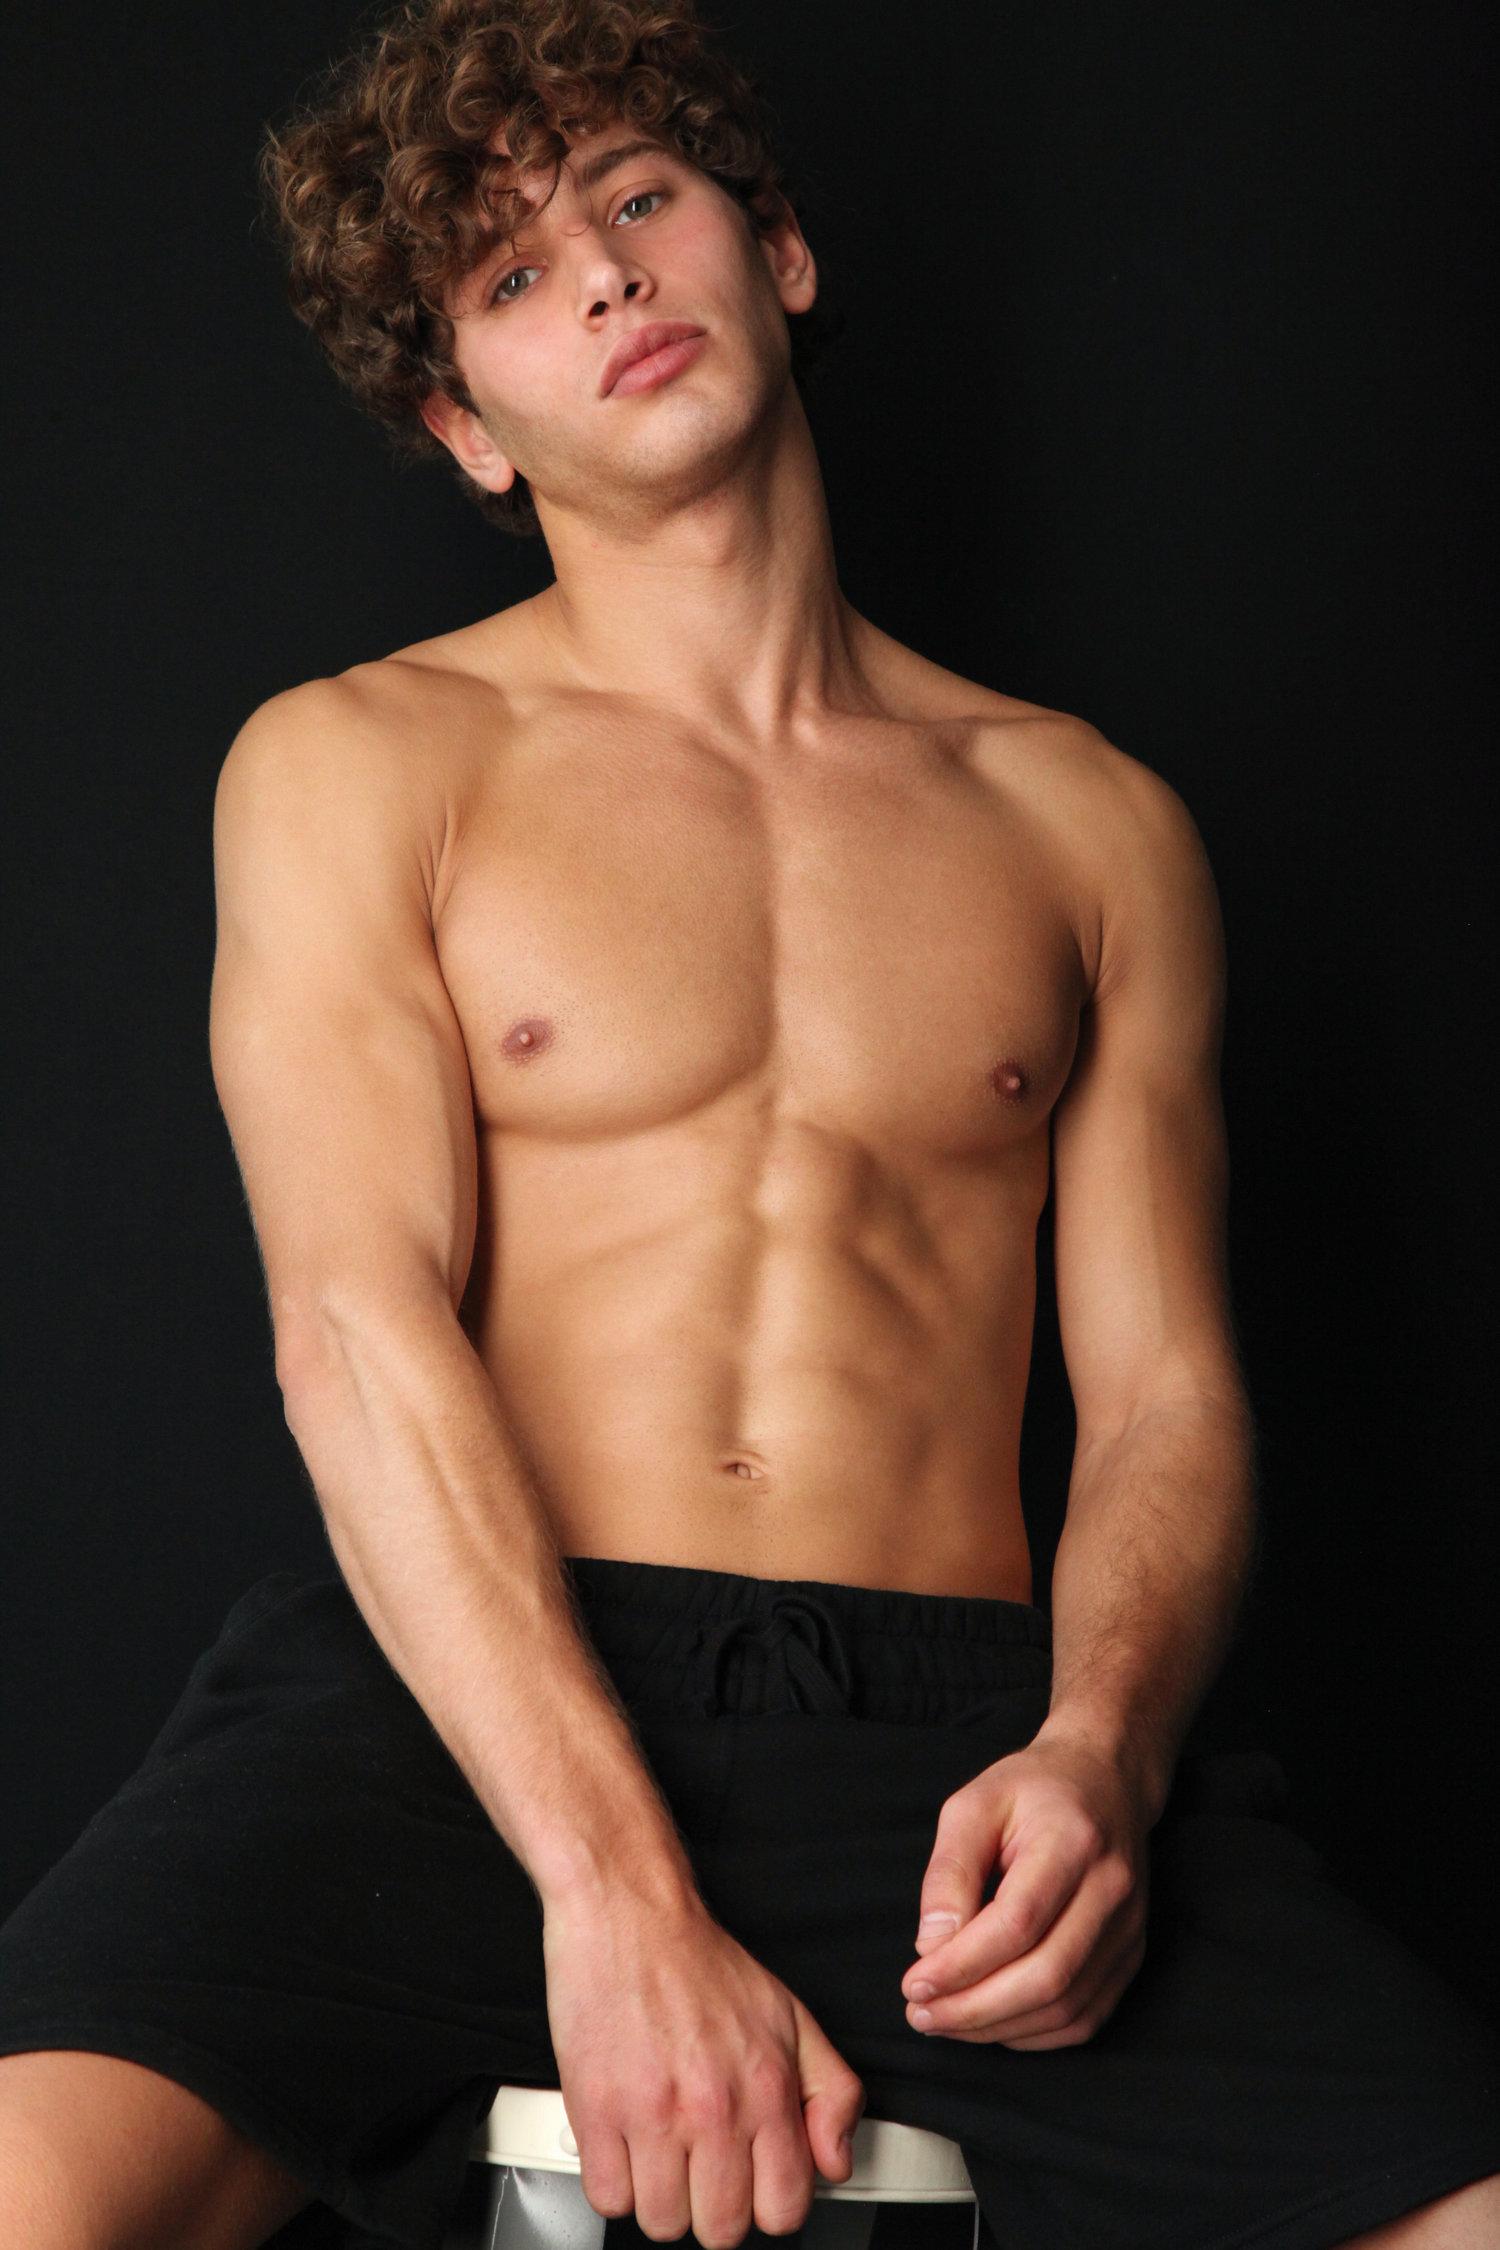 Adon Exclusive: Model Eyal Booker By Karl Slater